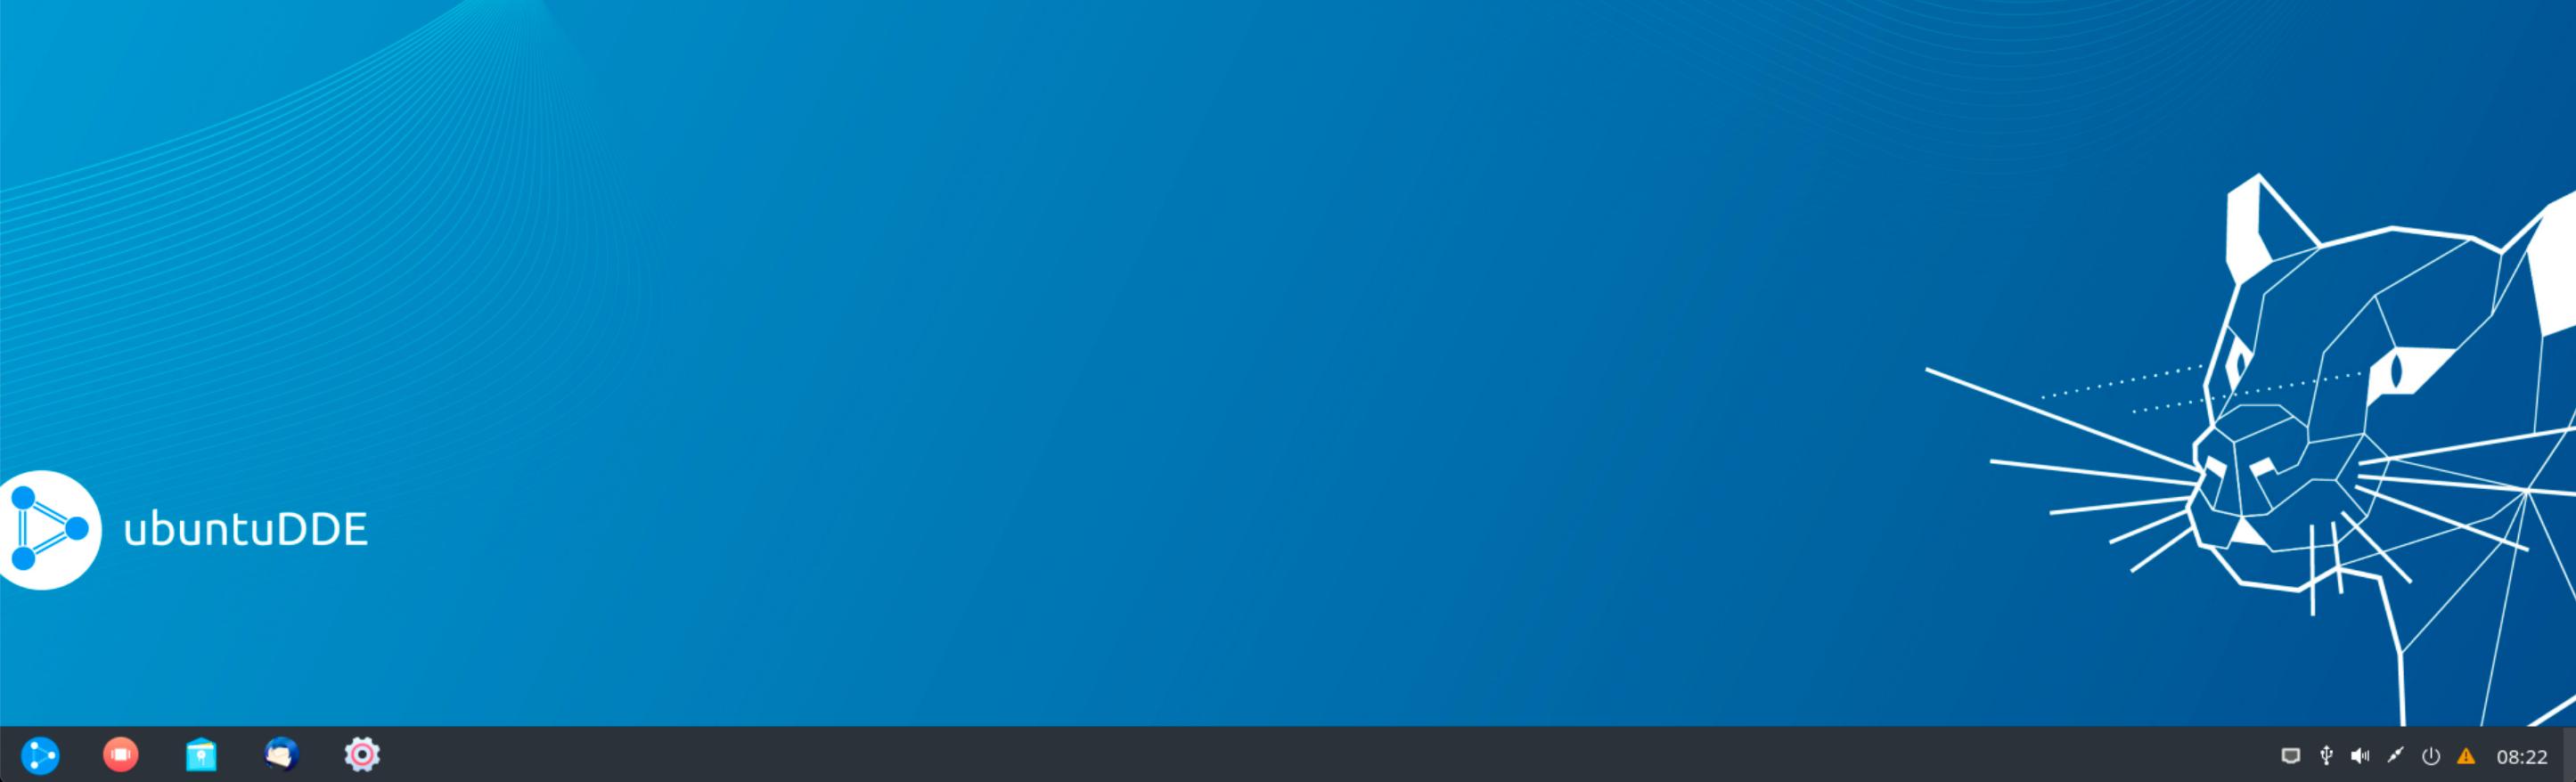 UbuntuDDE – Quand la jolie interface de Deepin s'intègre à Ubuntu